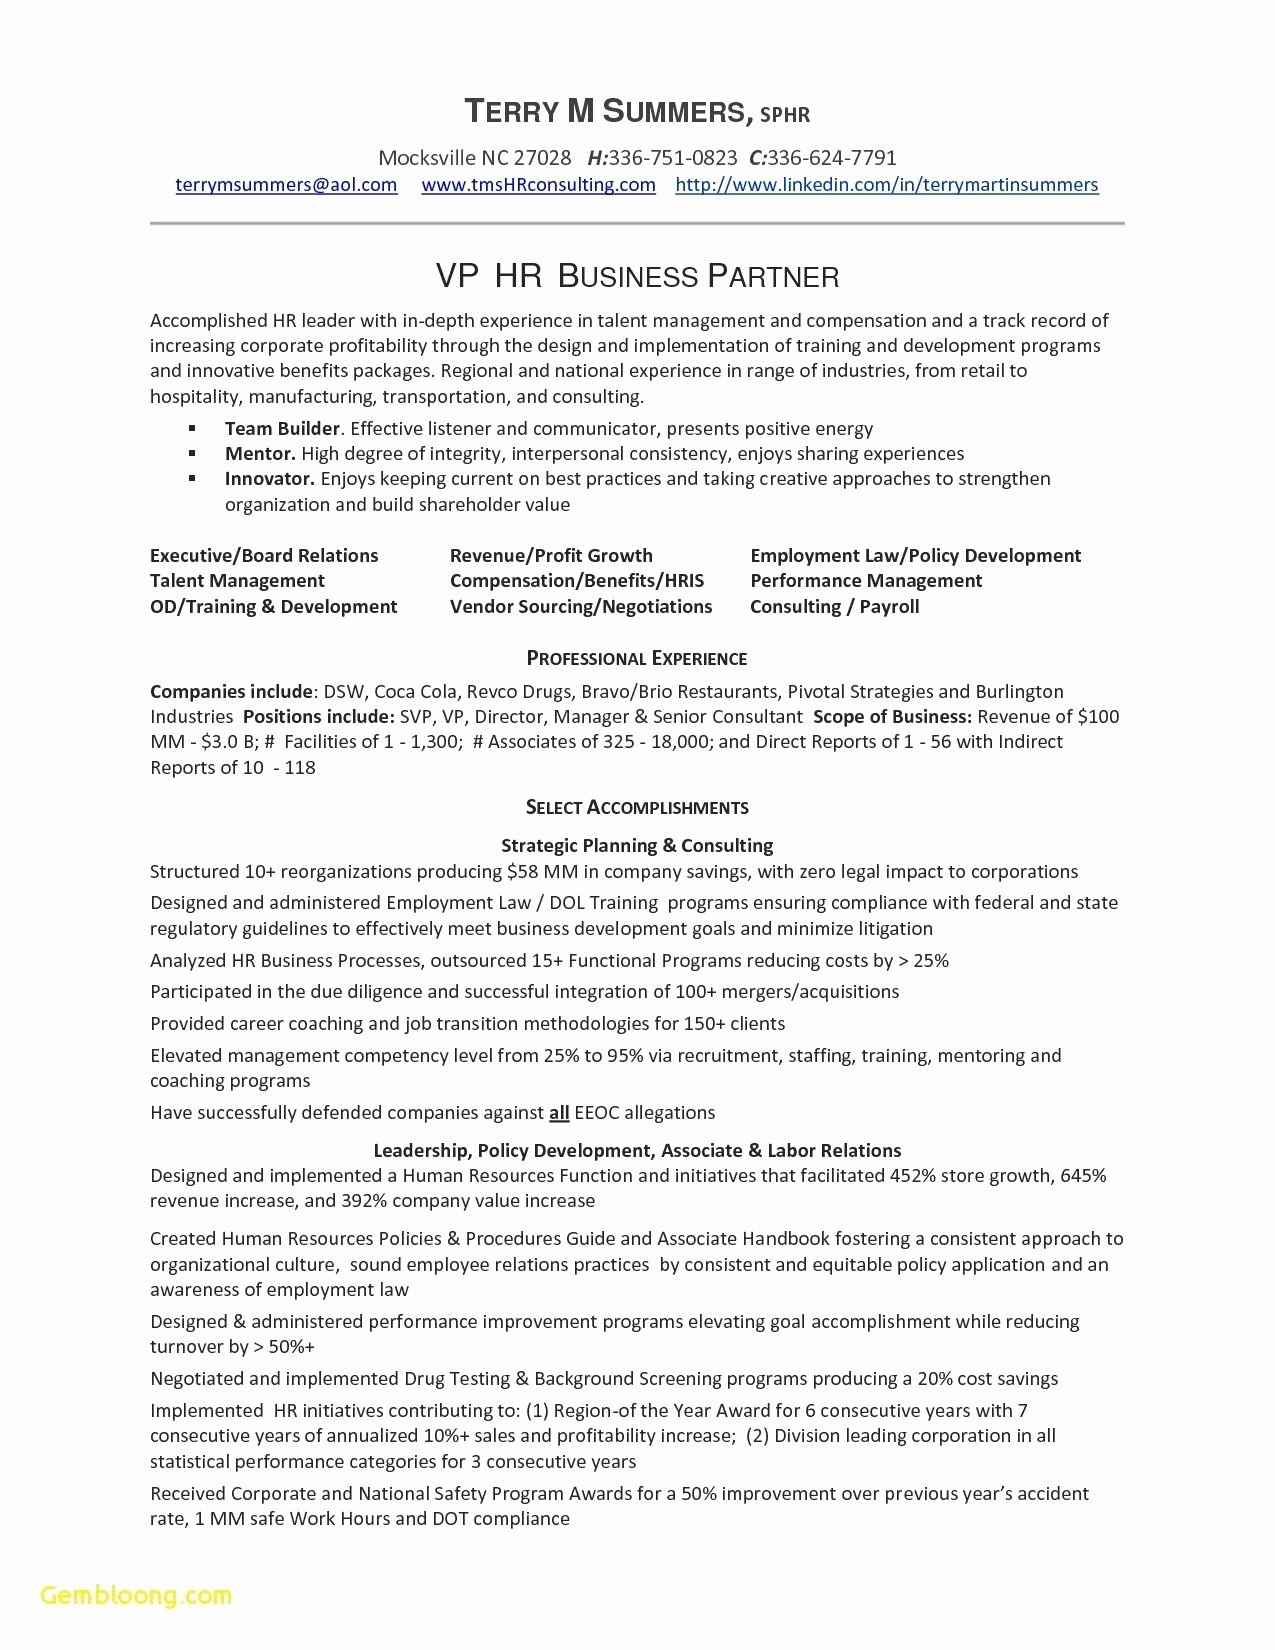 Resume Ibm Resume Lovely Fice Move Template Ibm Business